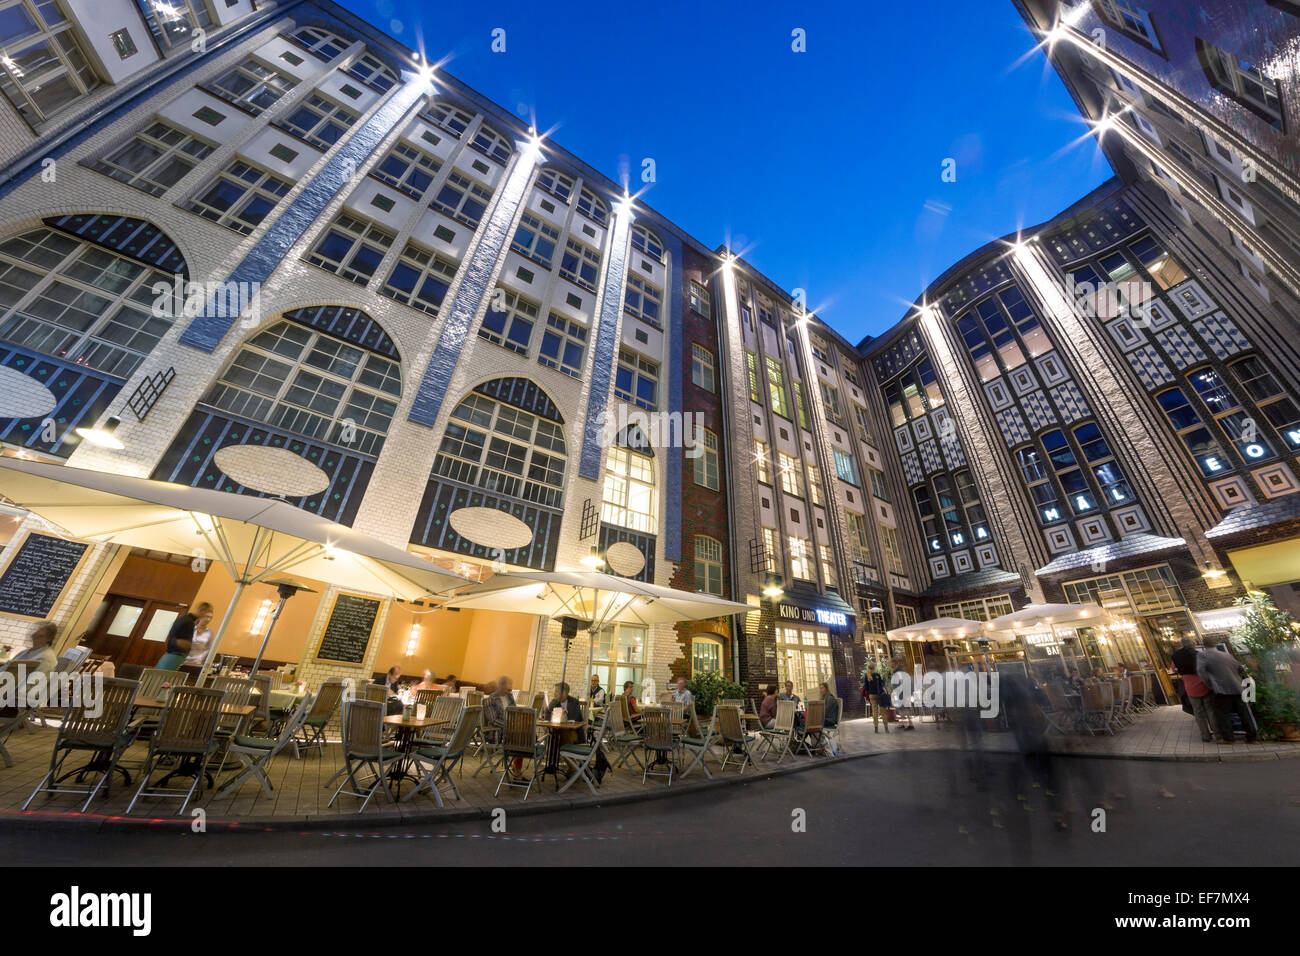 Hackesche Hoefe, Hakesch Courtyard, Fisheye, Berlin, Germany - Stock Image